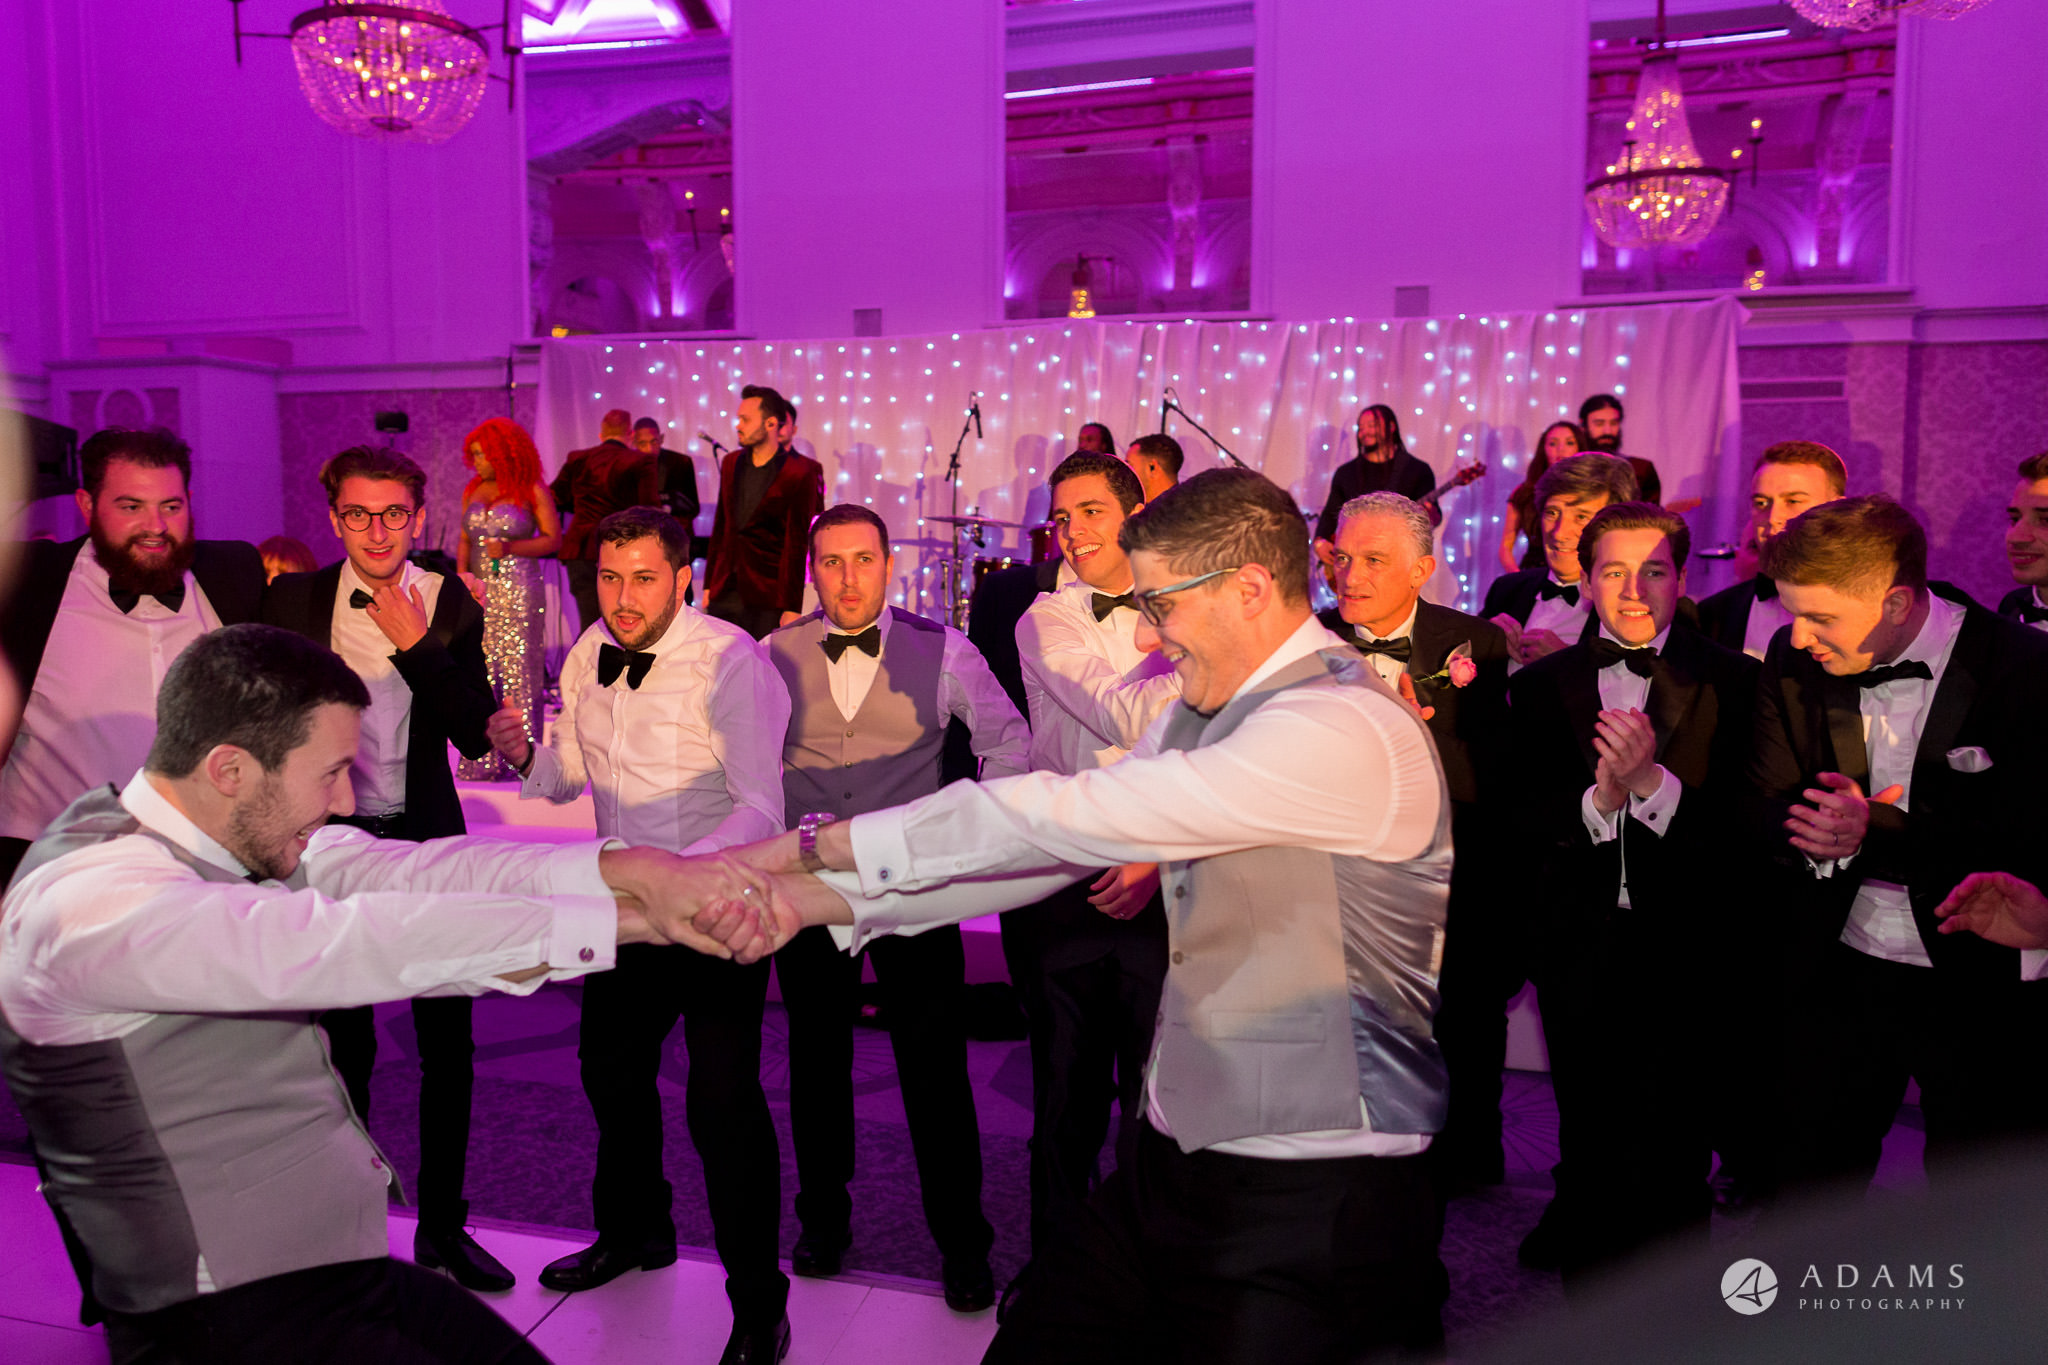 De Vere grand connaught rooms Israeli dance groom and his groomsmen